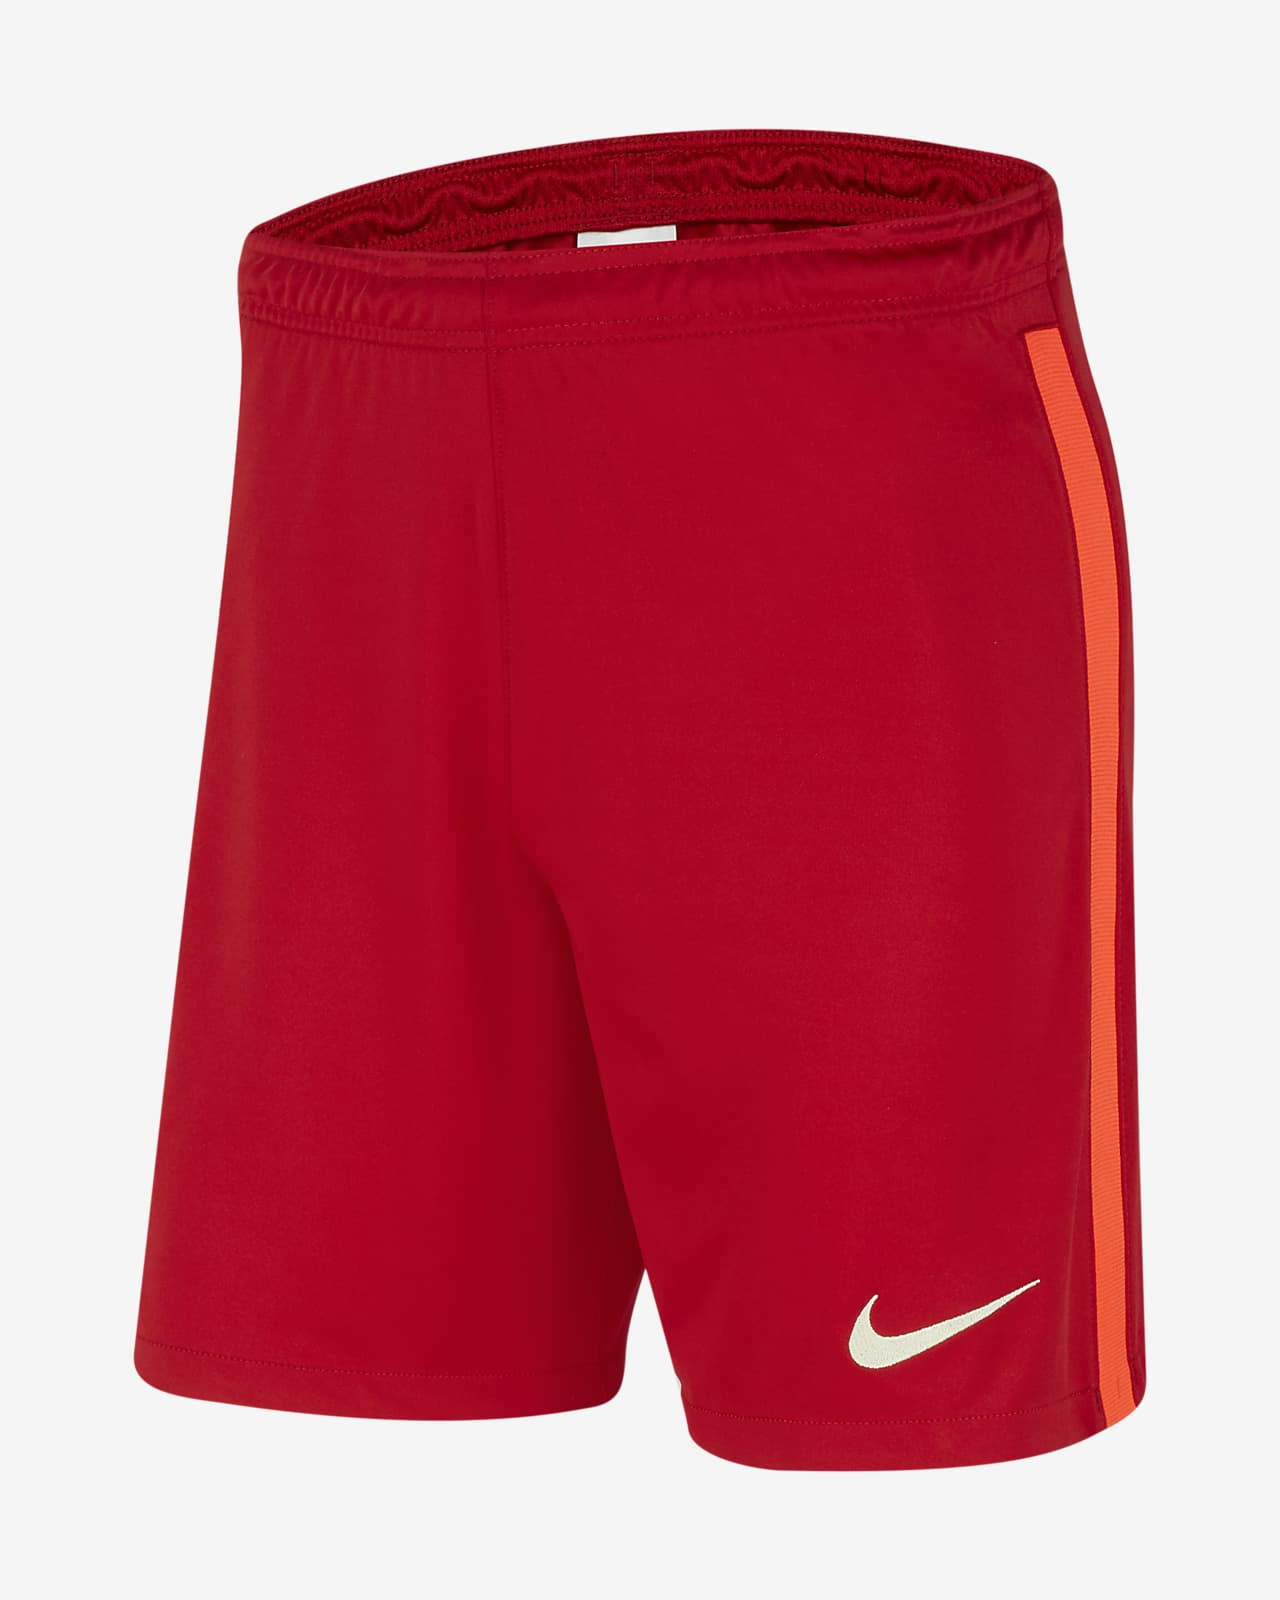 Liverpool FC 2021/22 Stadium Home Men's Soccer Shorts